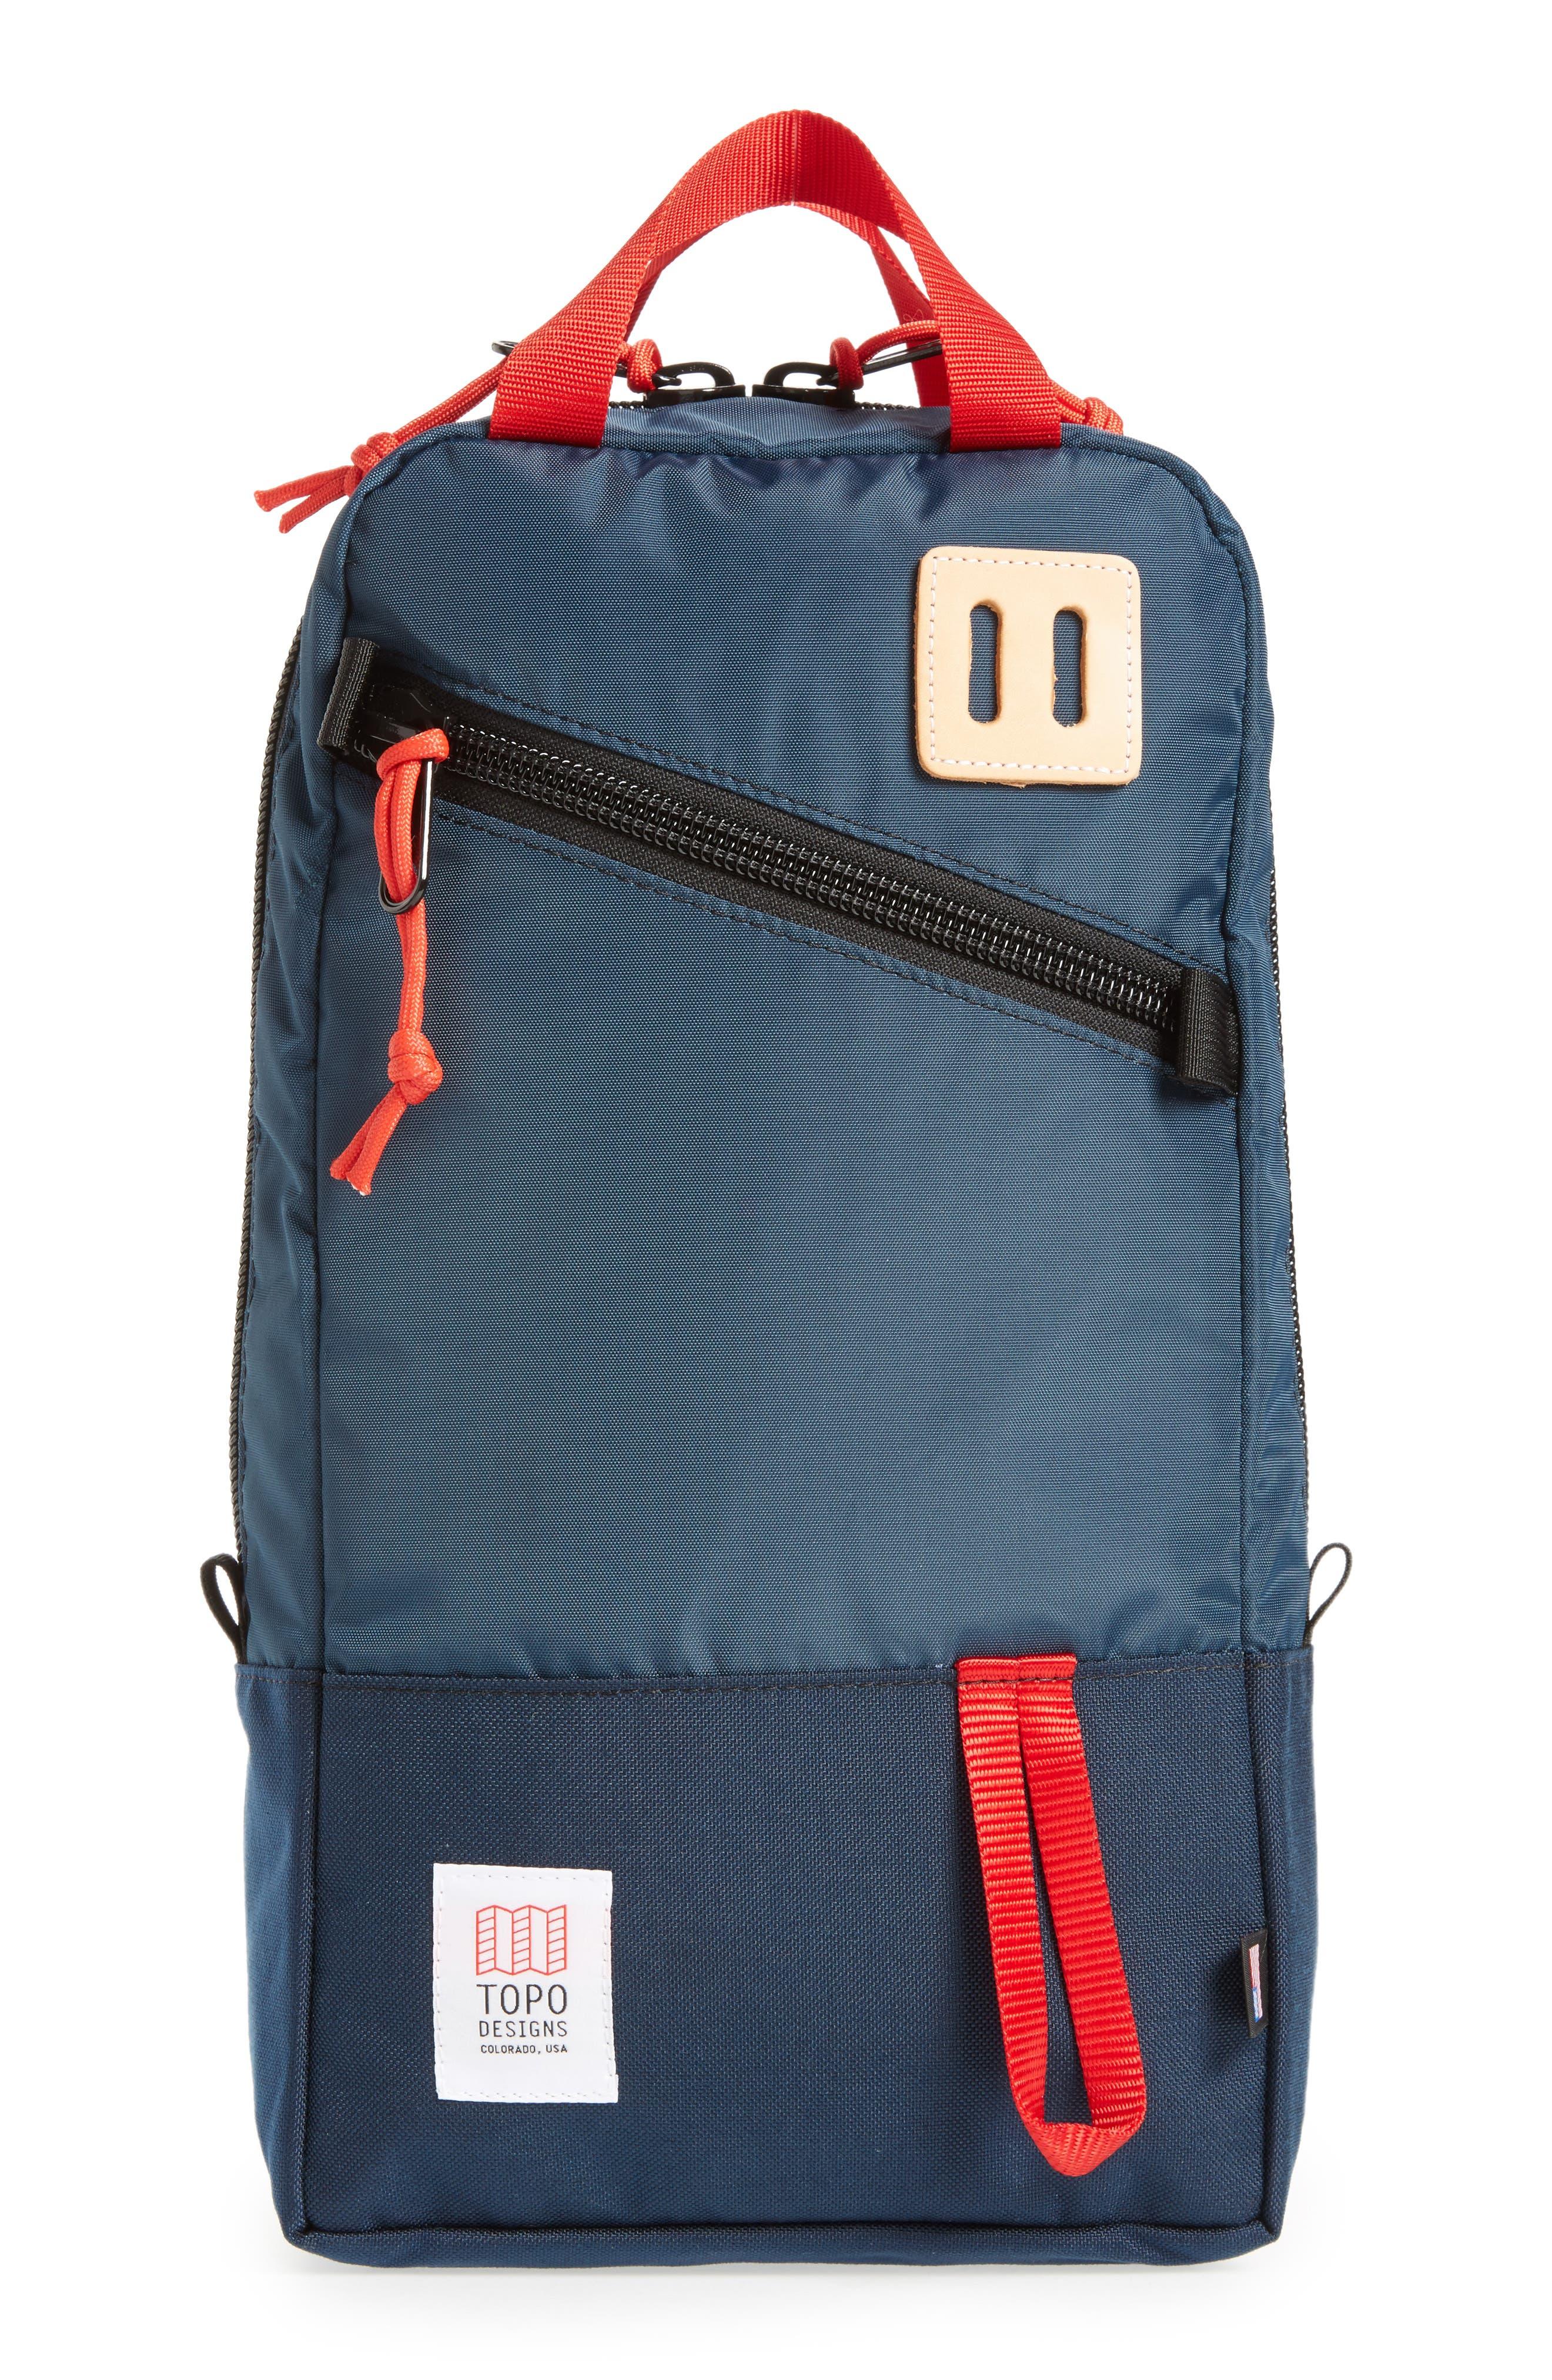 Main Image - Topo Designs Trip Backpack